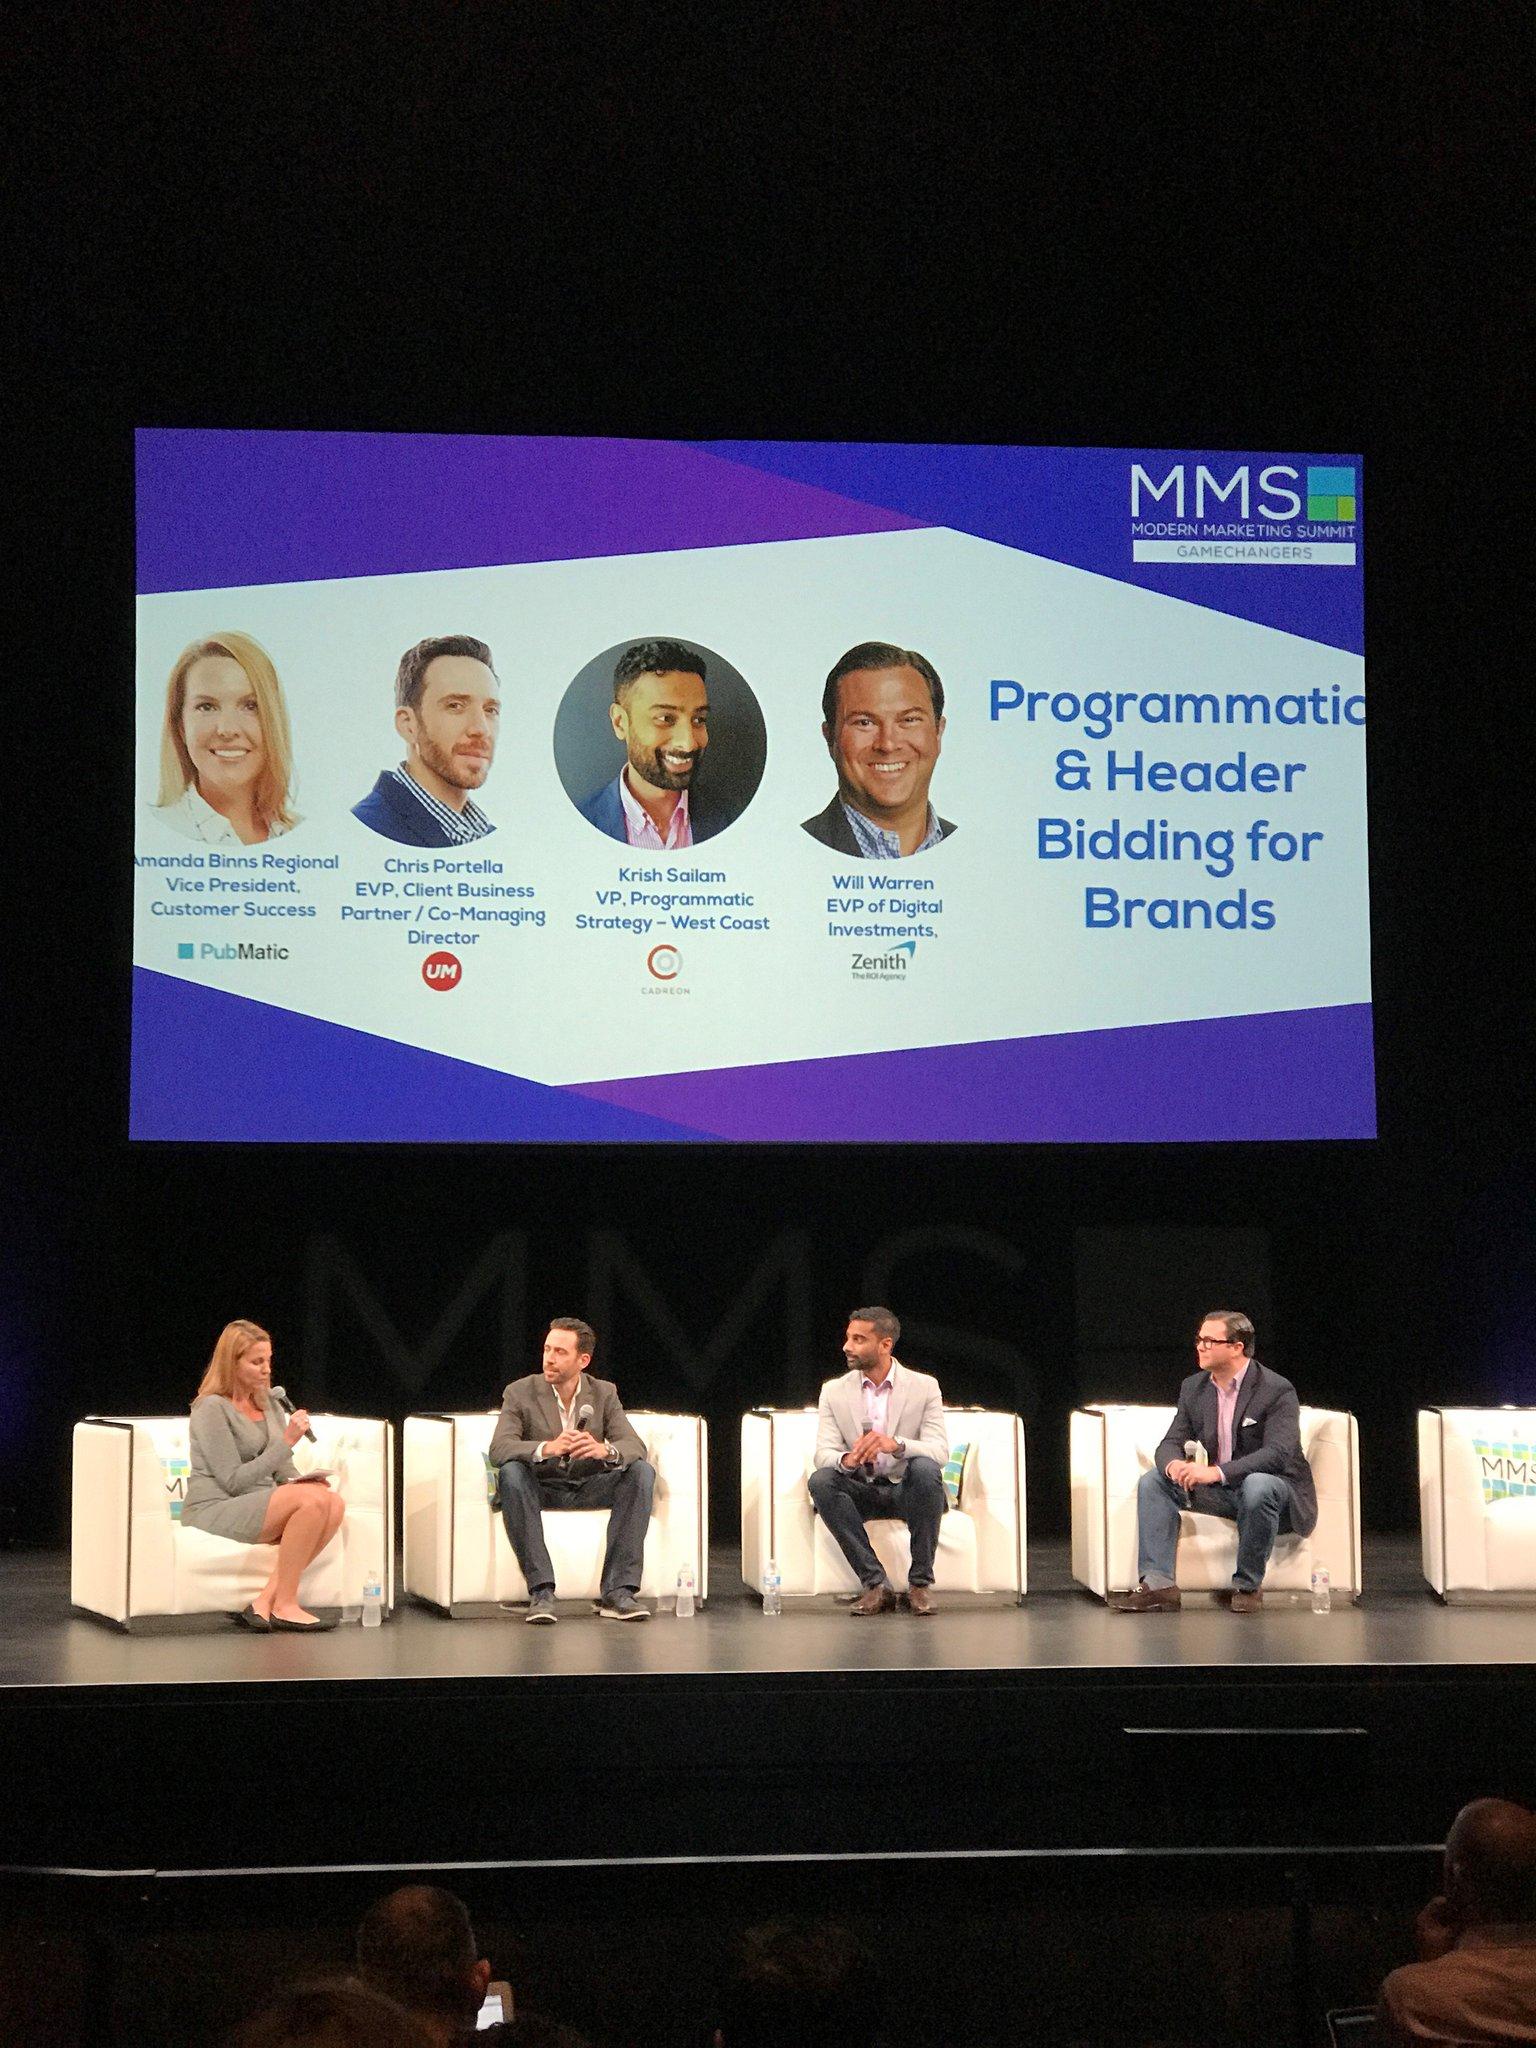 Chris Portella, EVP, Client Business Partner/Co-Managing Director, joined a MMS Gamechangers panel. https://t.co/i6RLCQDkln